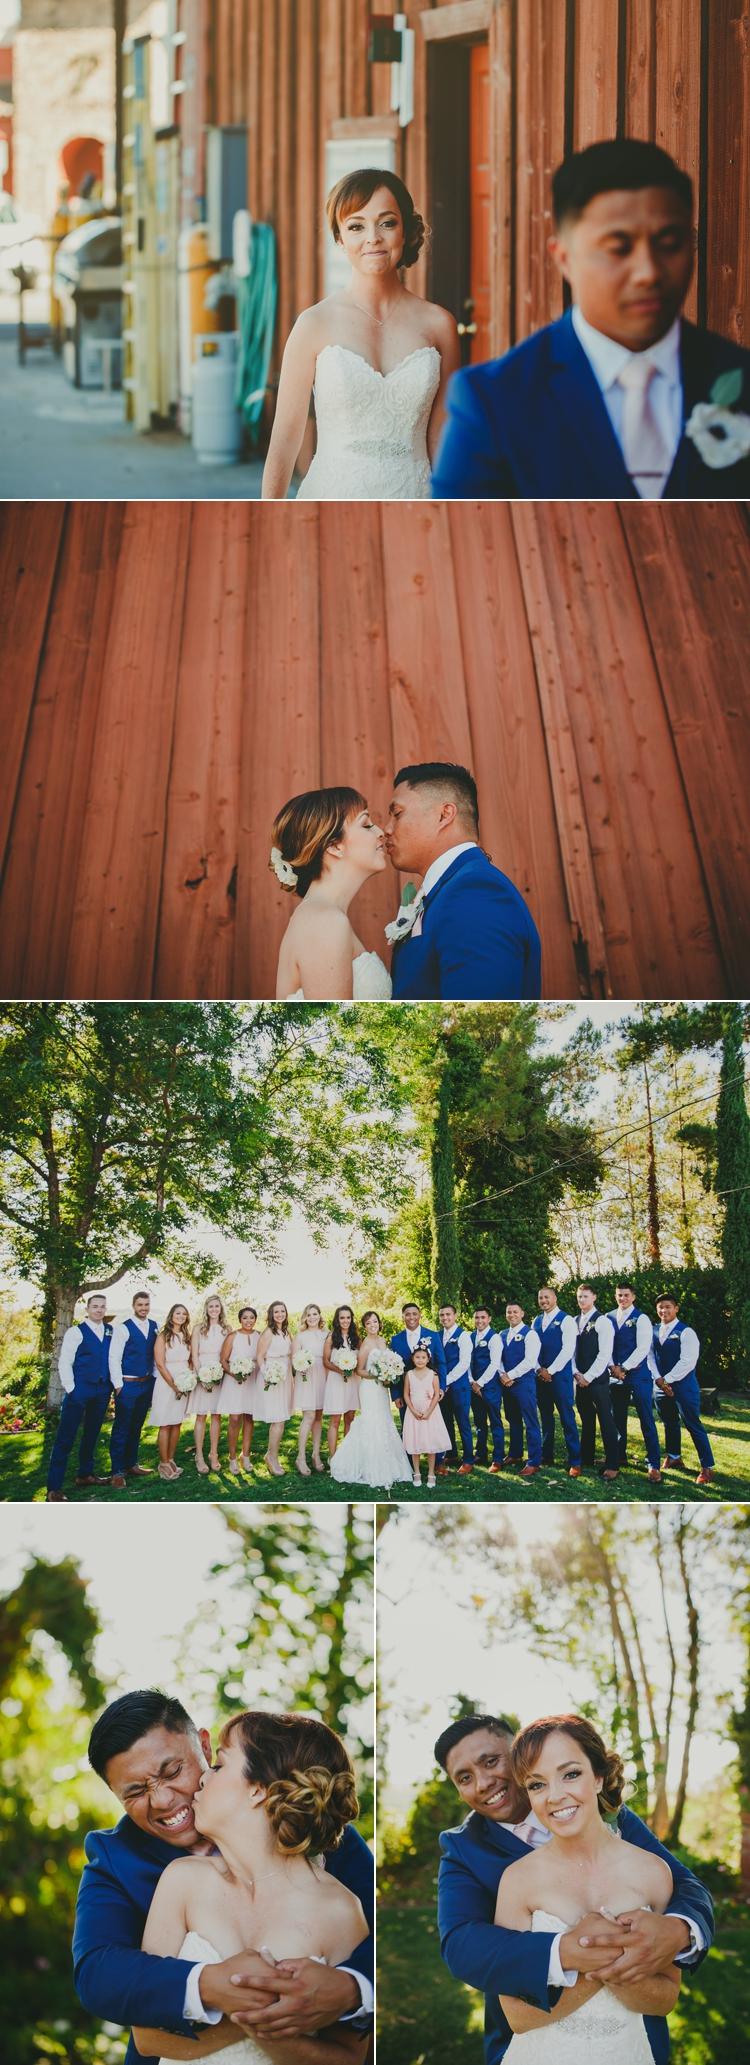 Falkner Winery Wedding Temecula